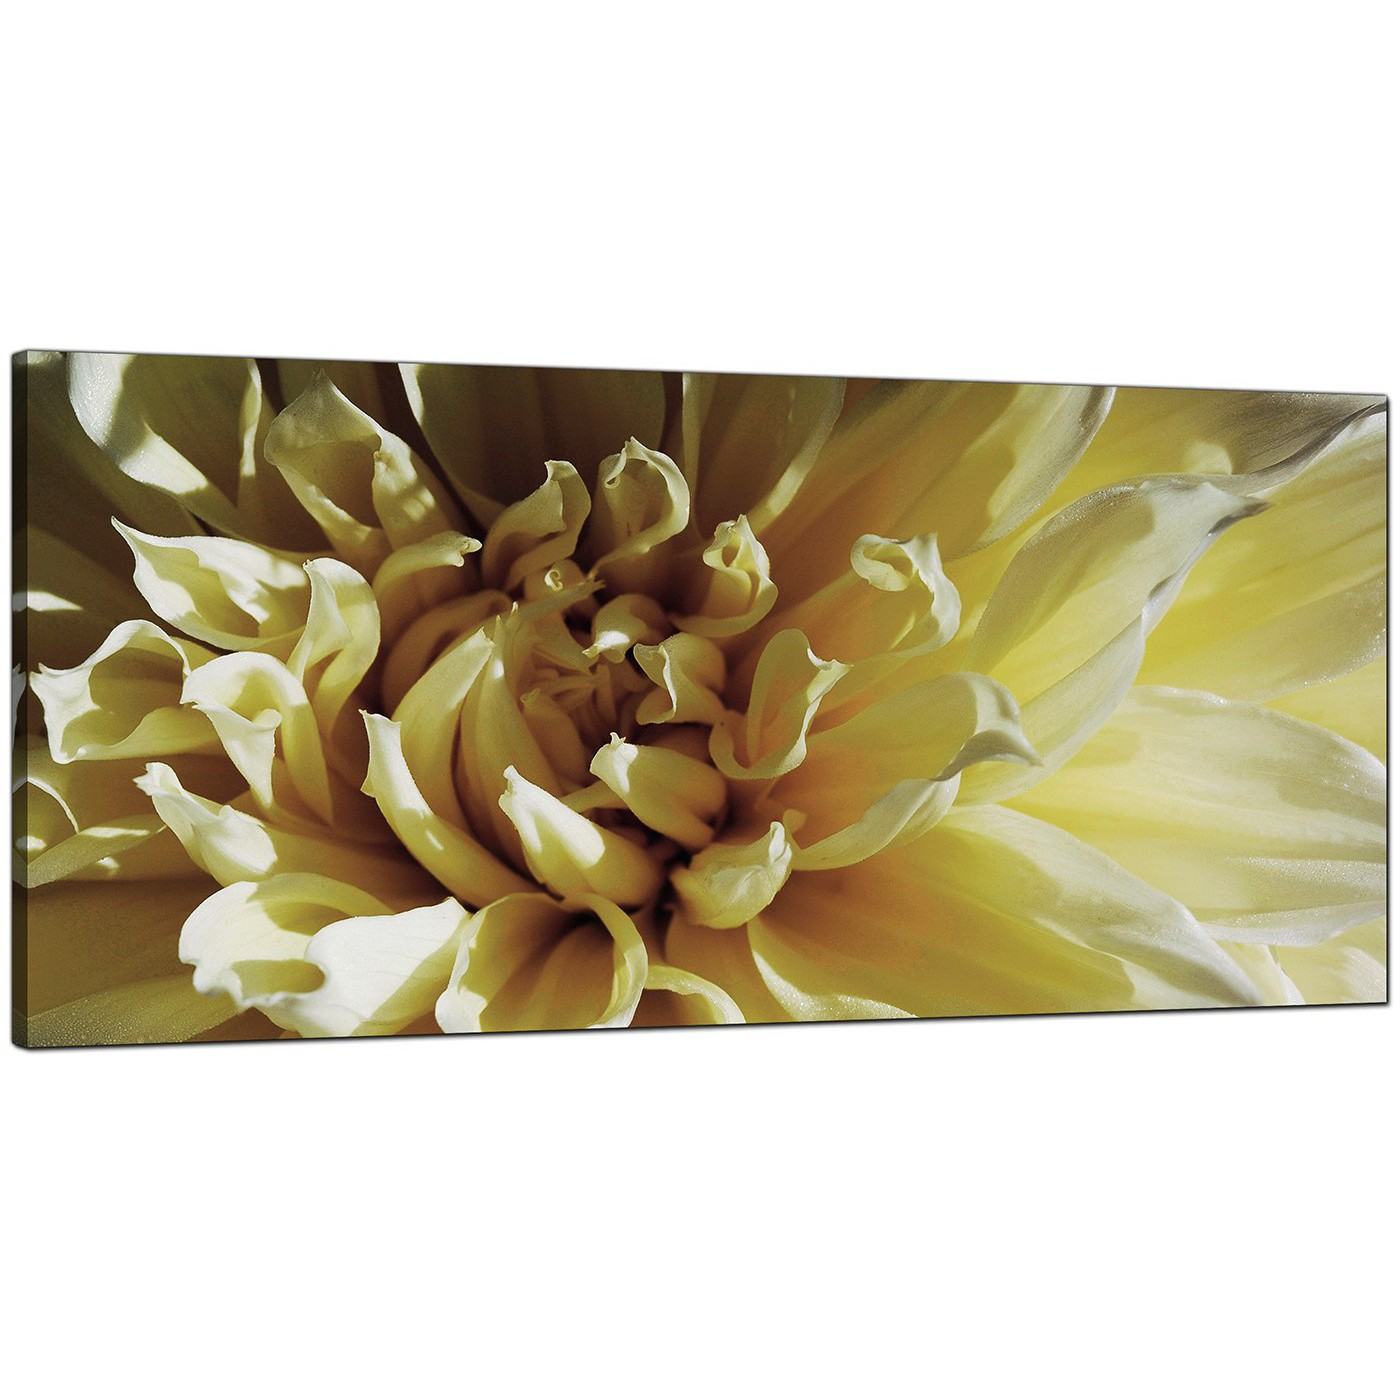 Modern Cream Canvas Prints of a Chrysanthemum Flower